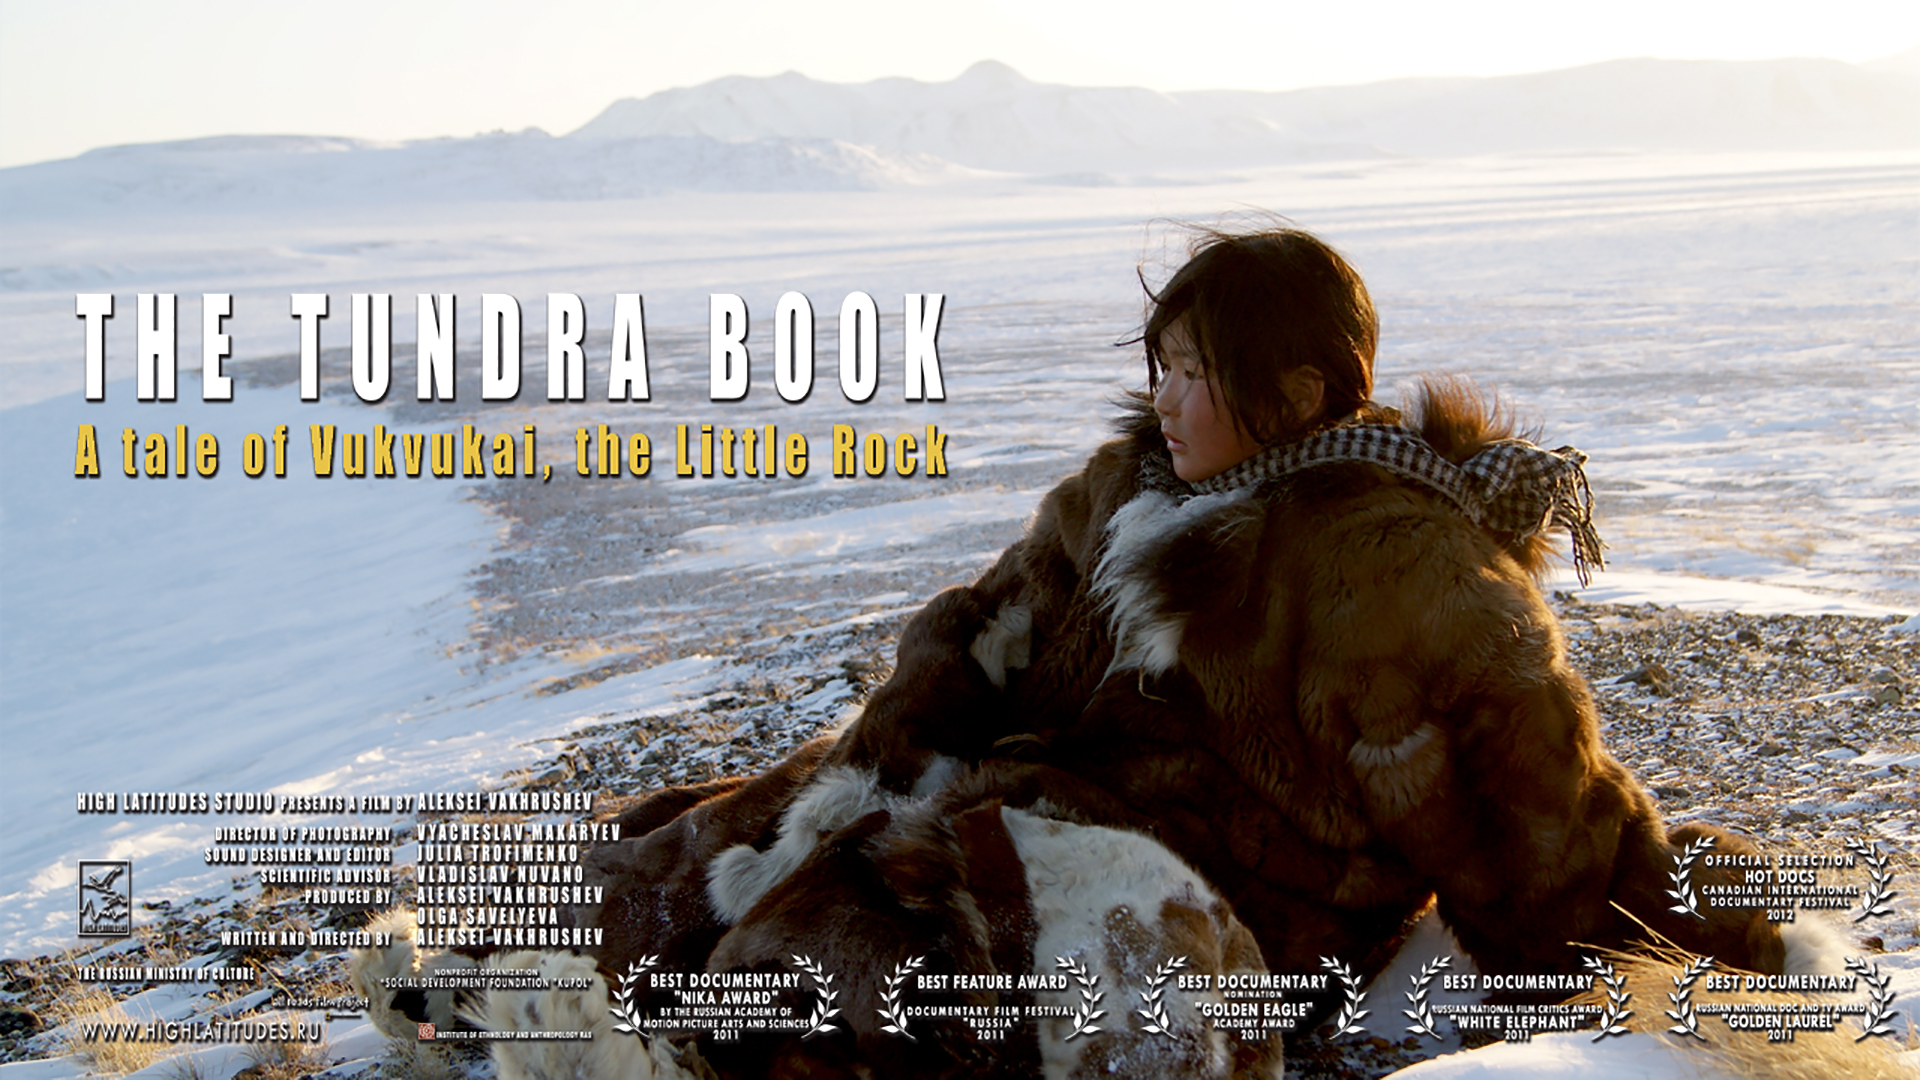 The Tundra Book